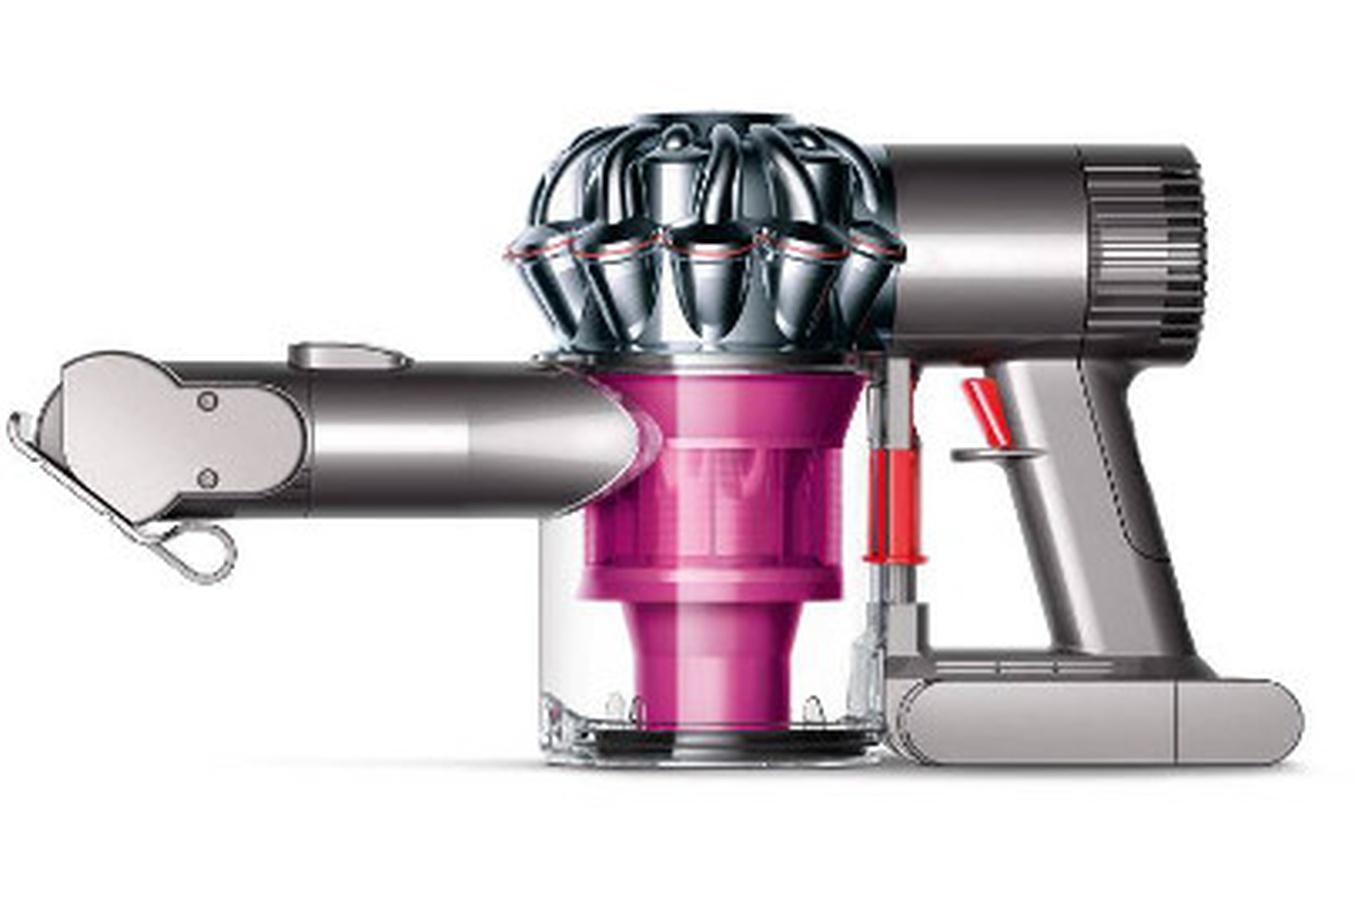 Aspirateur à main Dyson V6 Trigger + (via Click&Collect + ODR de 50€)